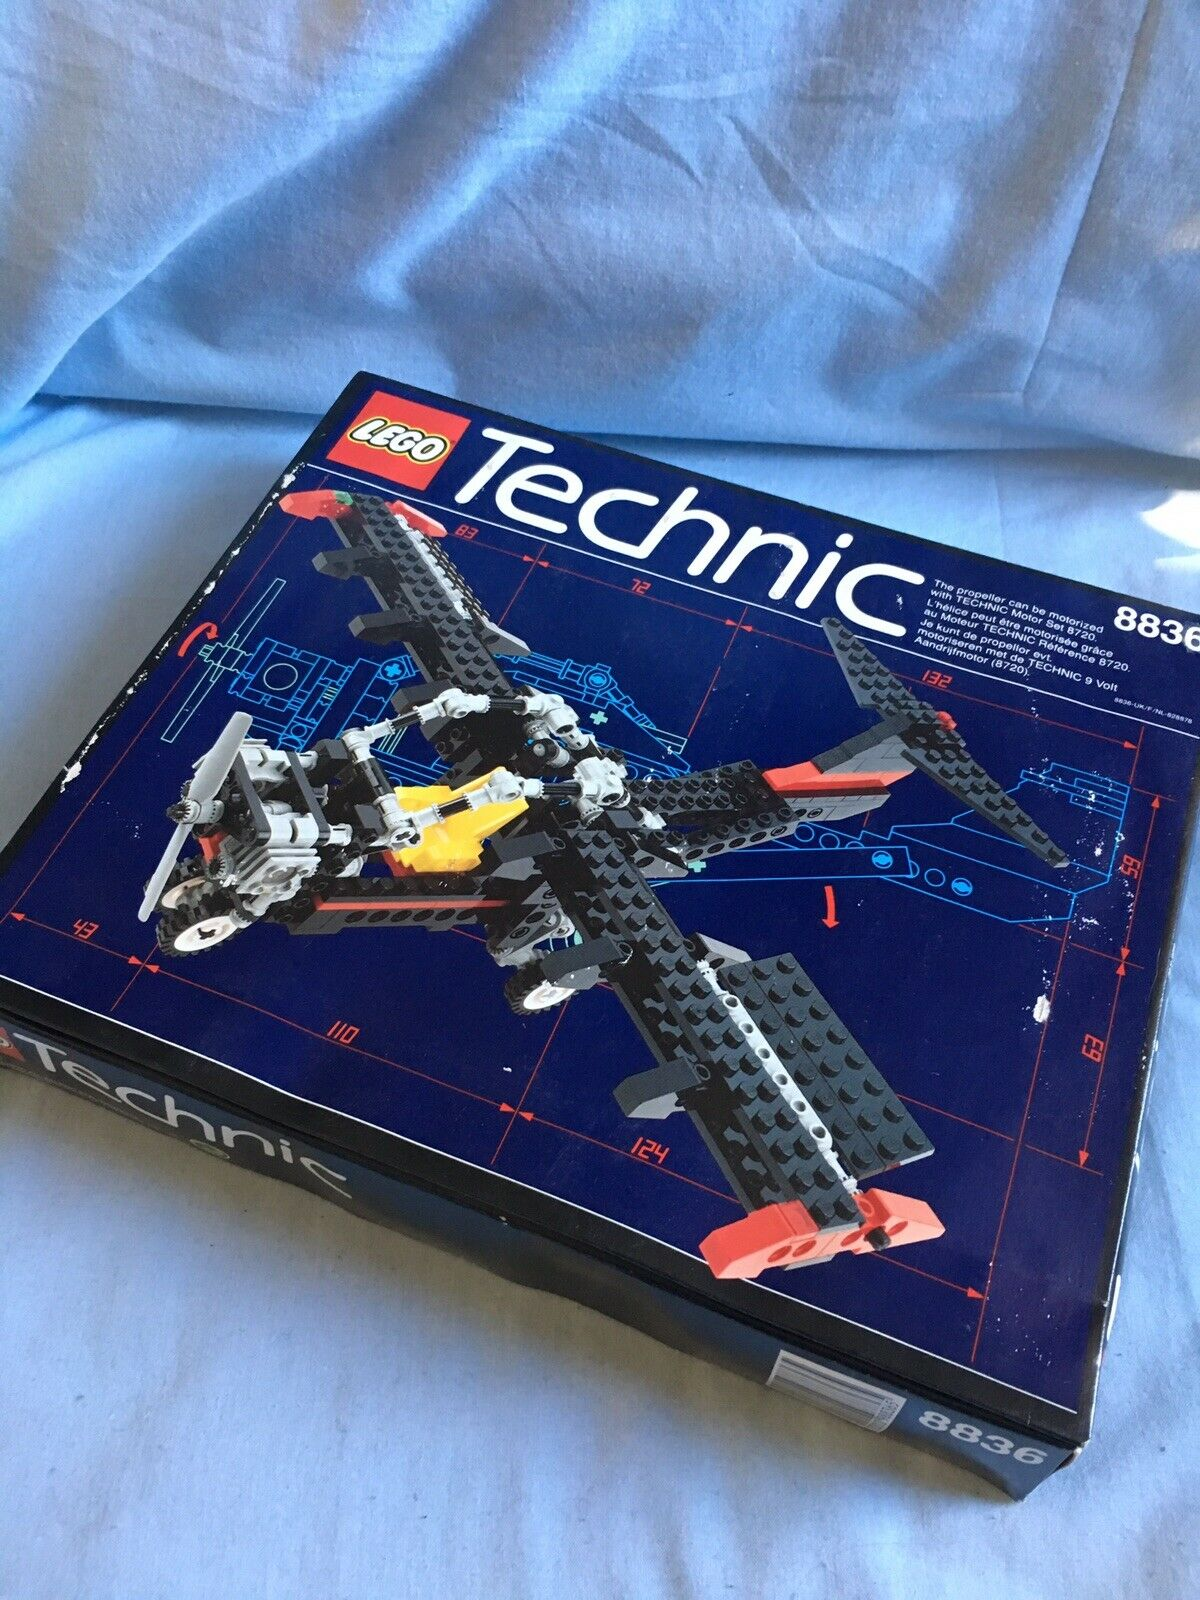 Lego Technic 8836, 1992, Original Factory Sealead låda, Fair Condition, fri Post